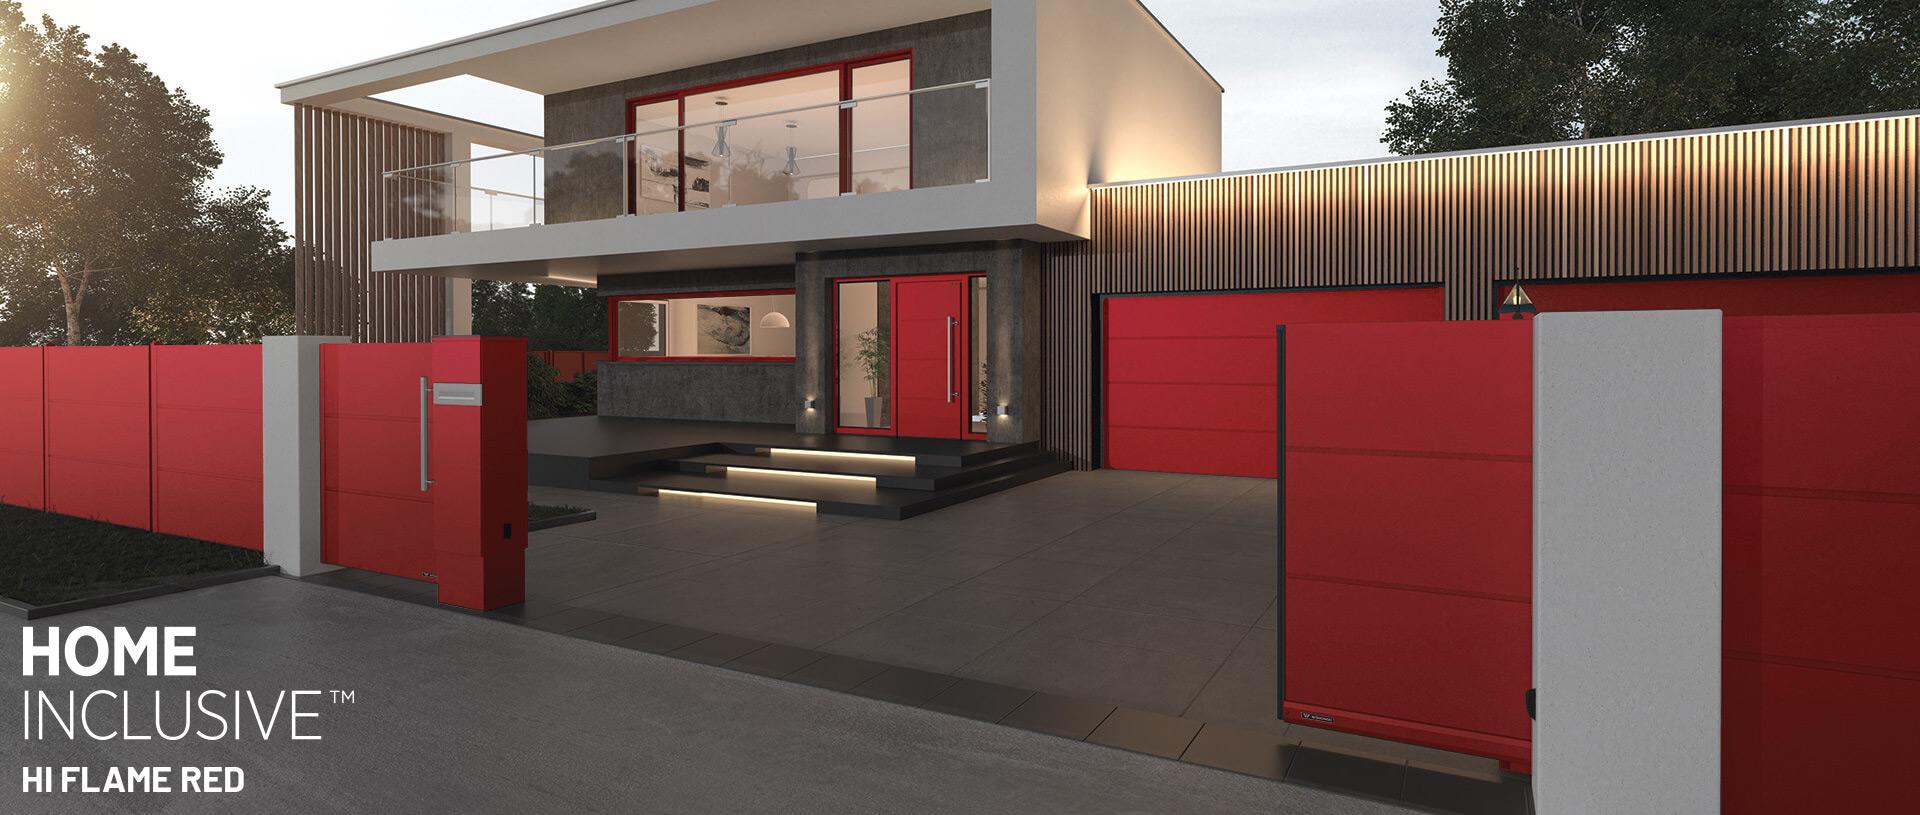 Home Inclusive Hi Flame Red Wiśniowski. Adams Salon partnerski Żary